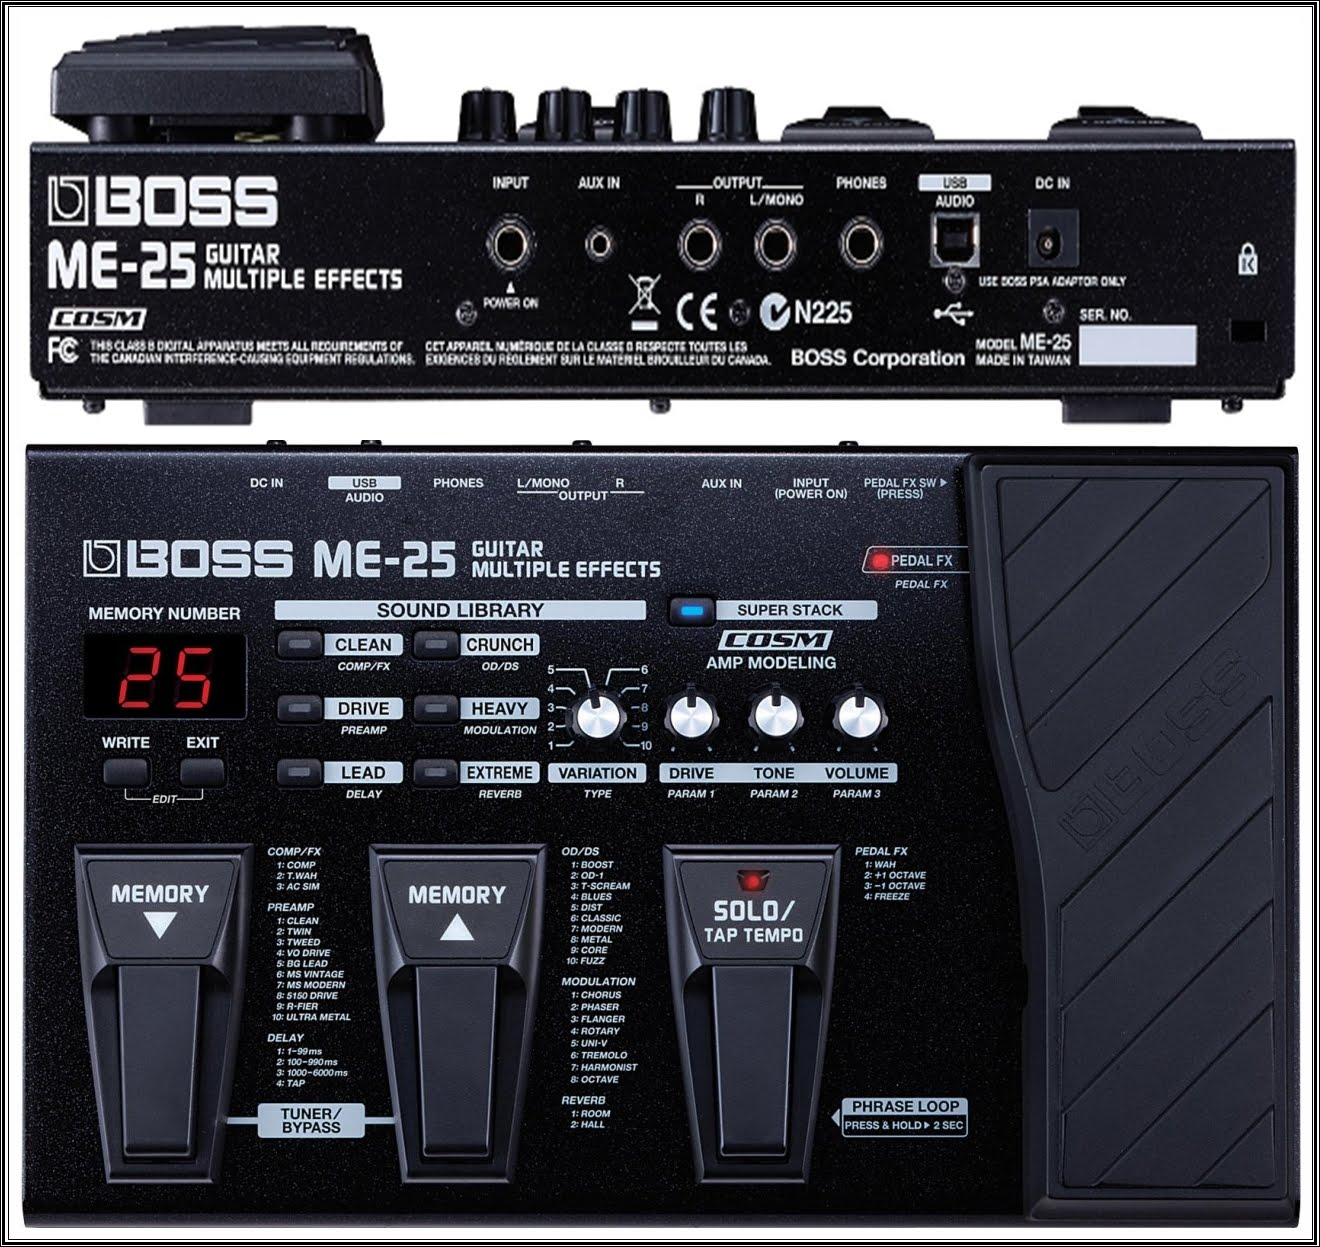 guitars blog boss me 25 guitar multiple effects specifications. Black Bedroom Furniture Sets. Home Design Ideas